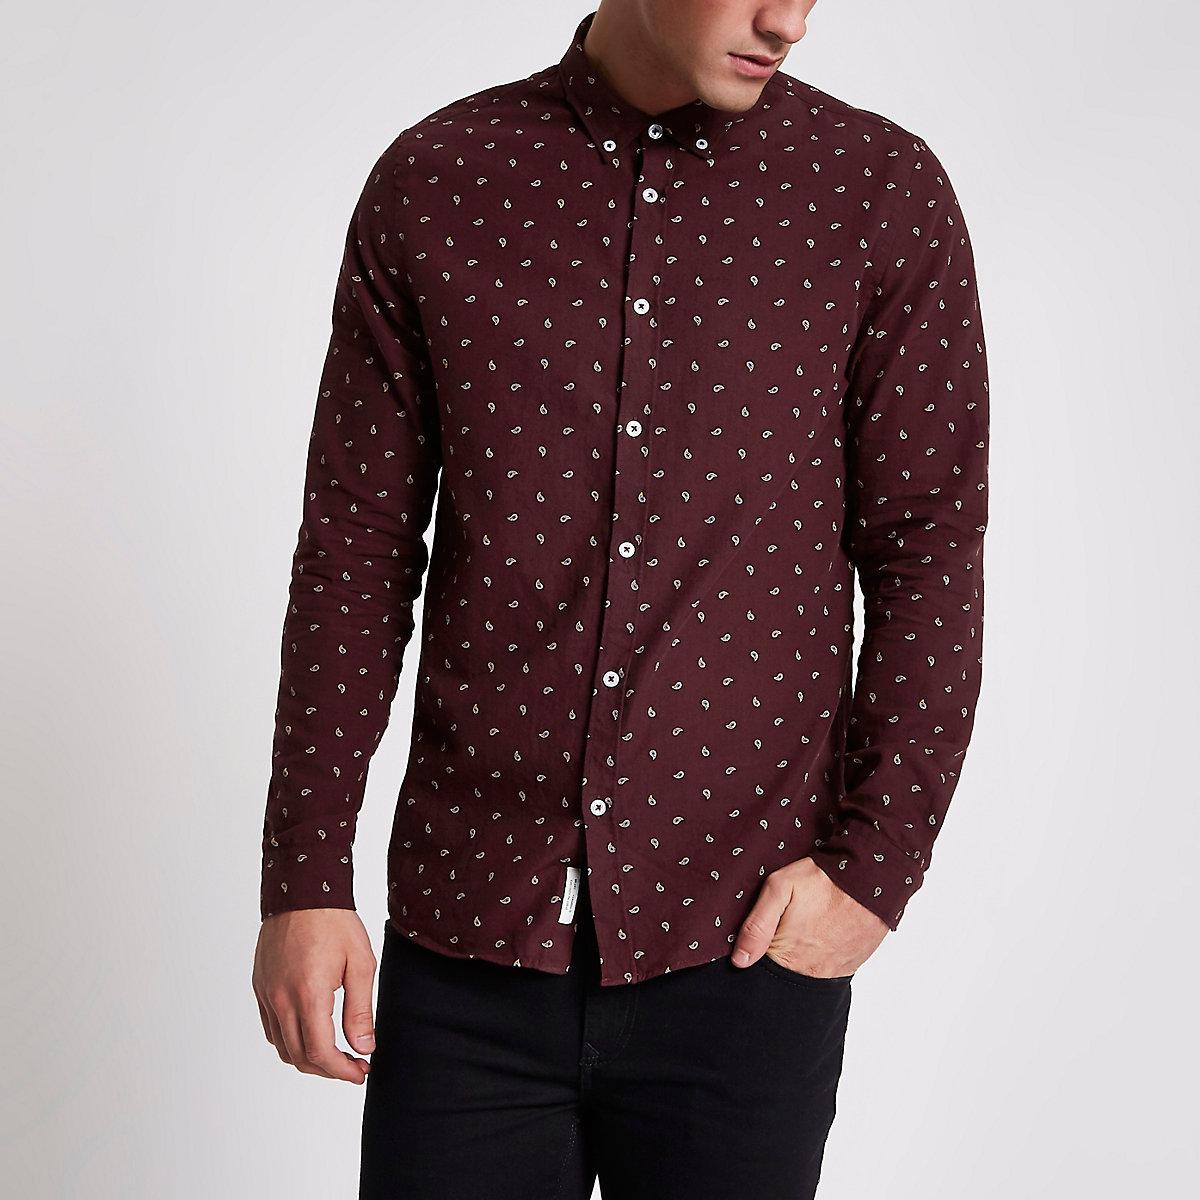 Dark red paisley long sleeve Oxford shirt